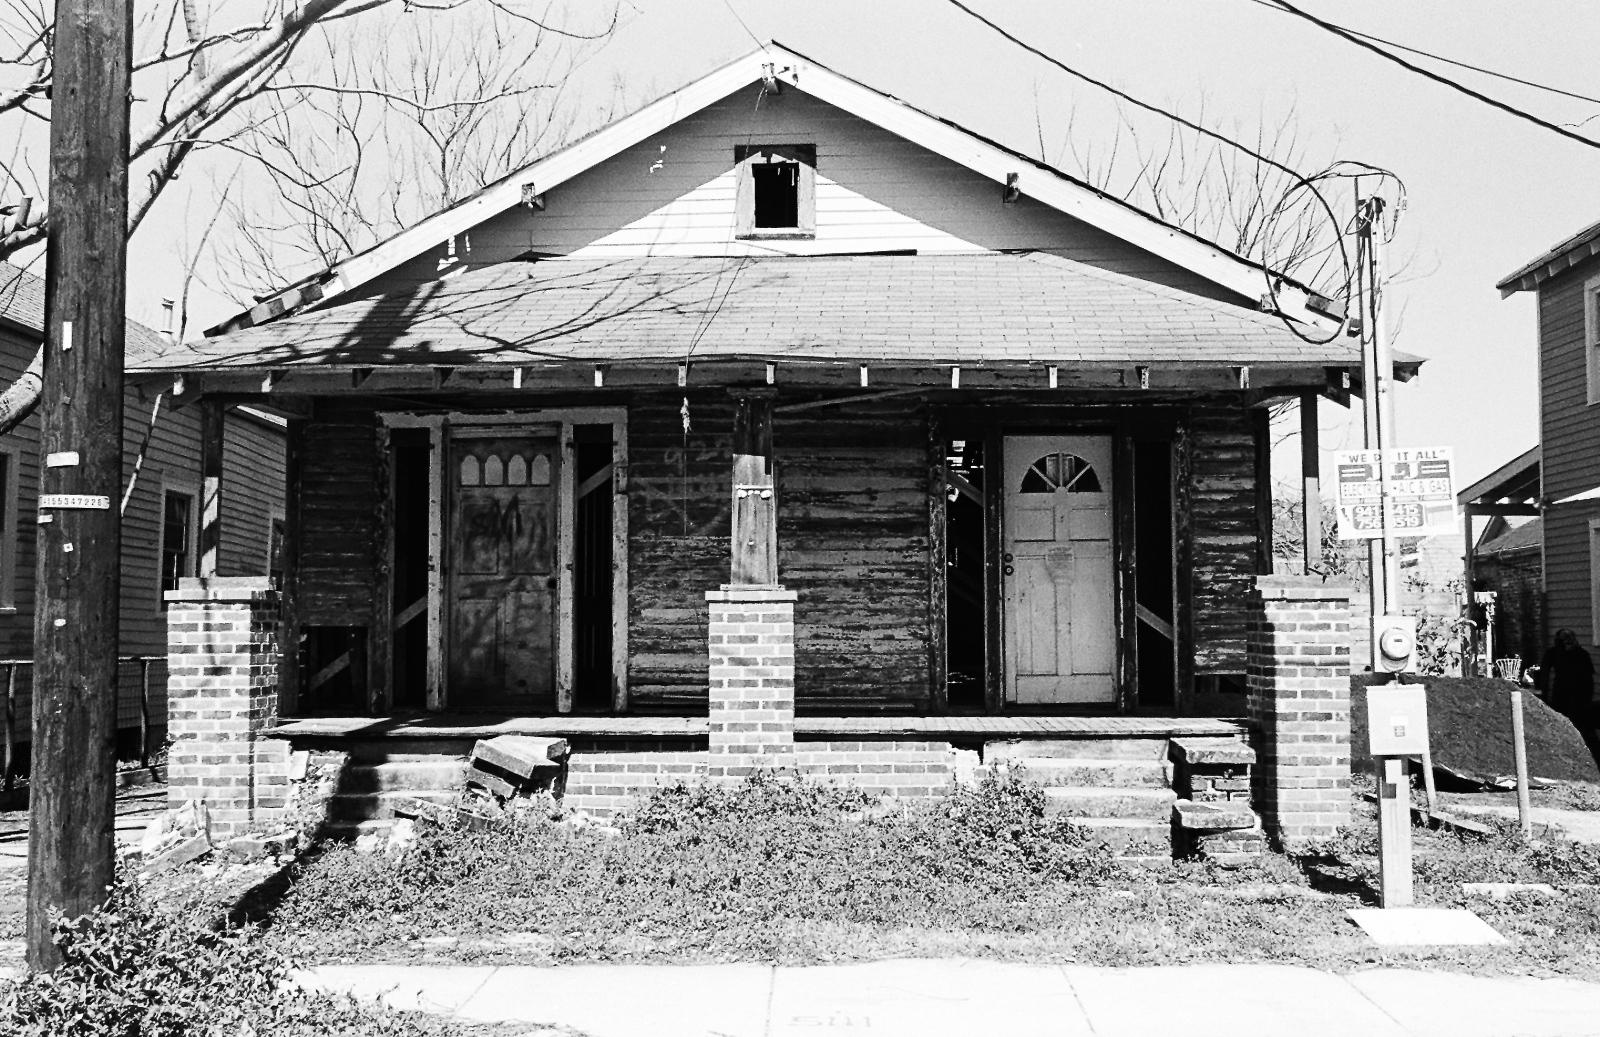 Art and Documentary Photography - Loading 9thwardhouse2.jpg